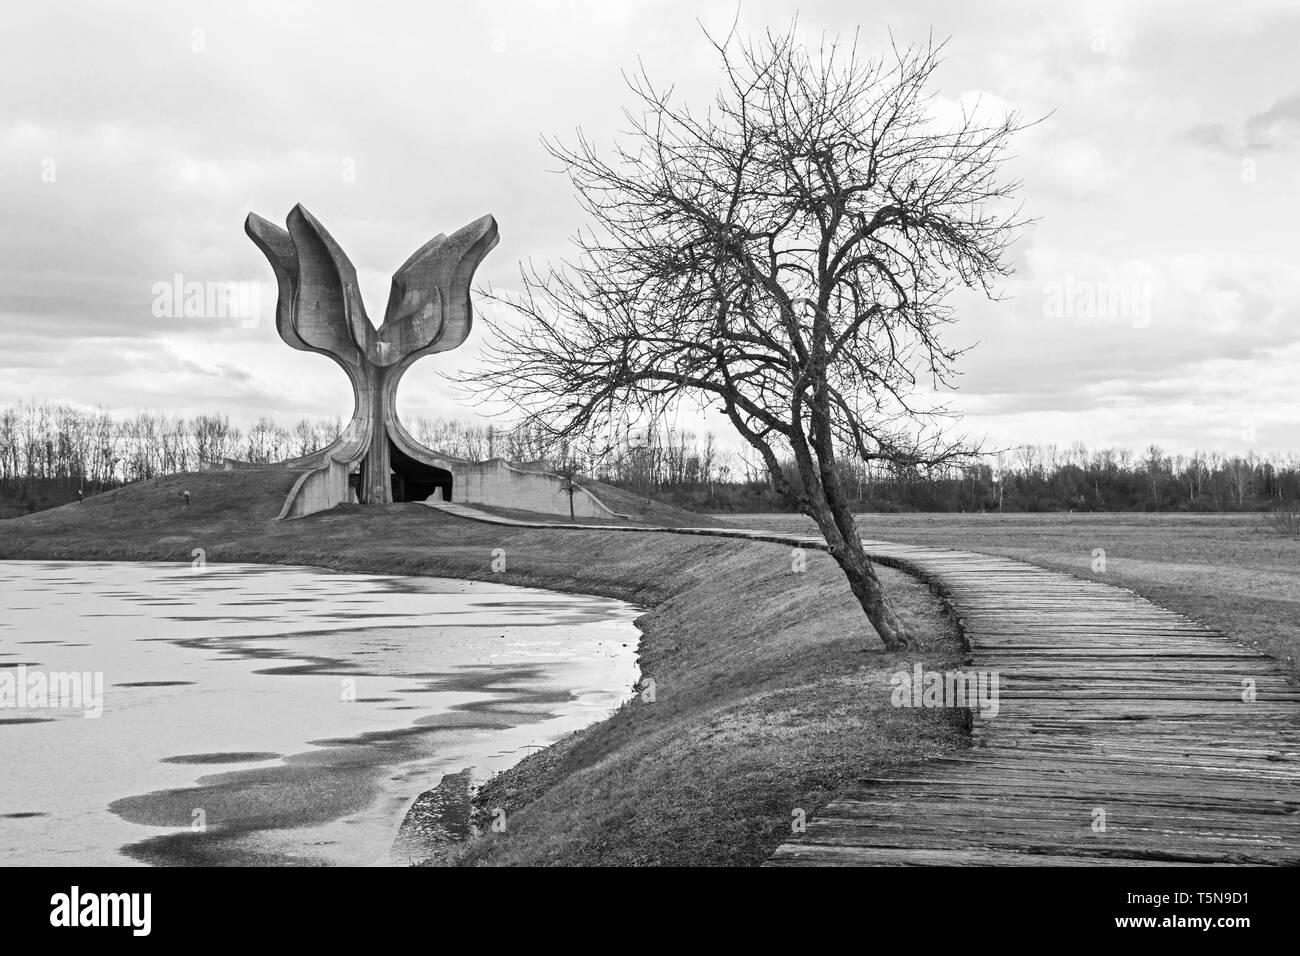 Jasenovac, Croatia - January 3rd 2019. The Stone Flower, a Yugoslavia era war memorial on the site of the former Jasenovac concentration camp - Stock Image